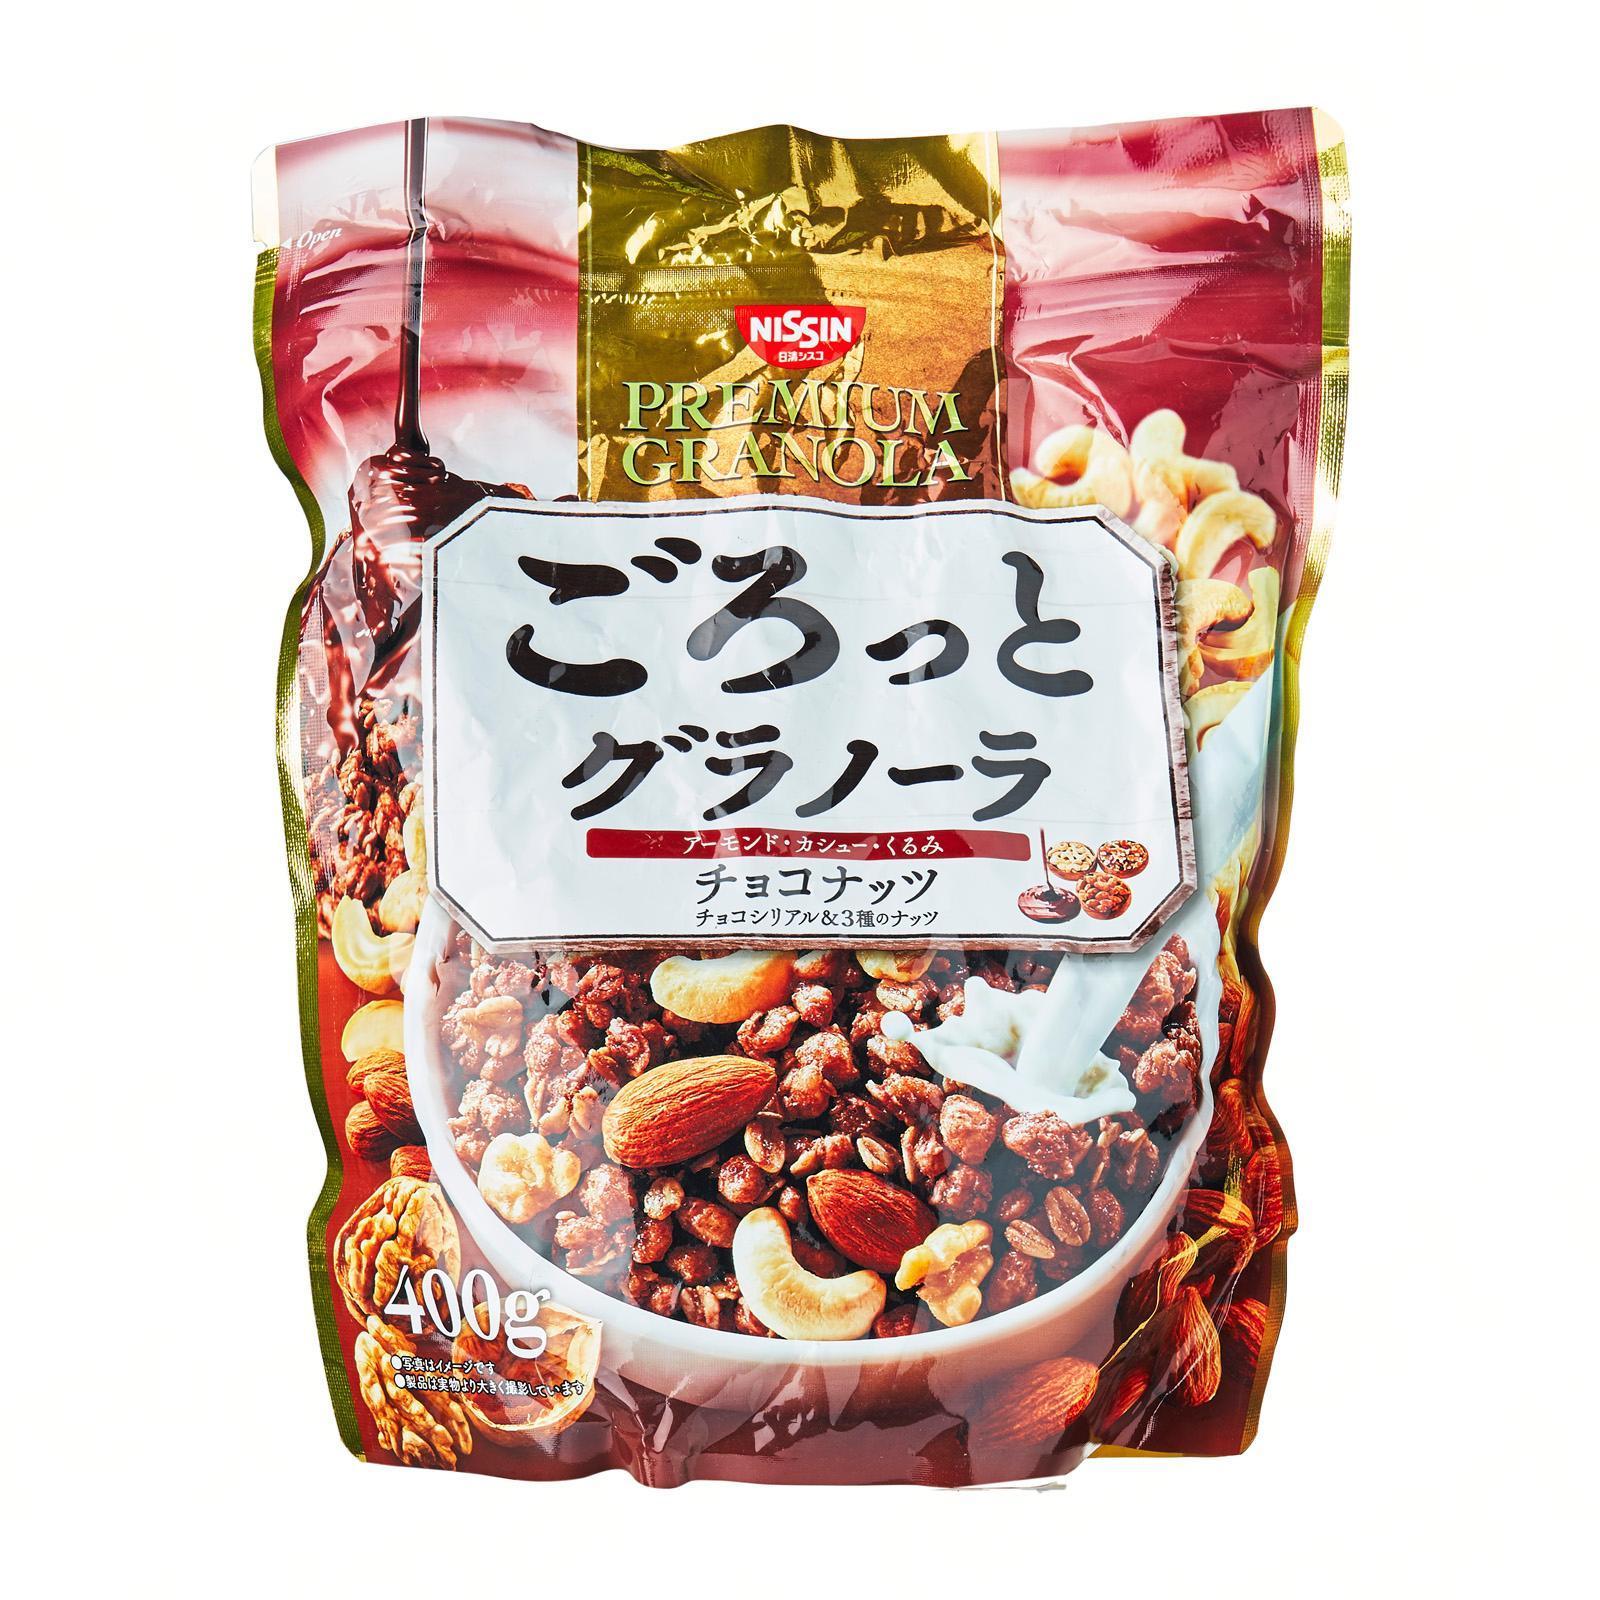 Nissin Gorotto Chocolate Nuts Flavour Breakfast Granola